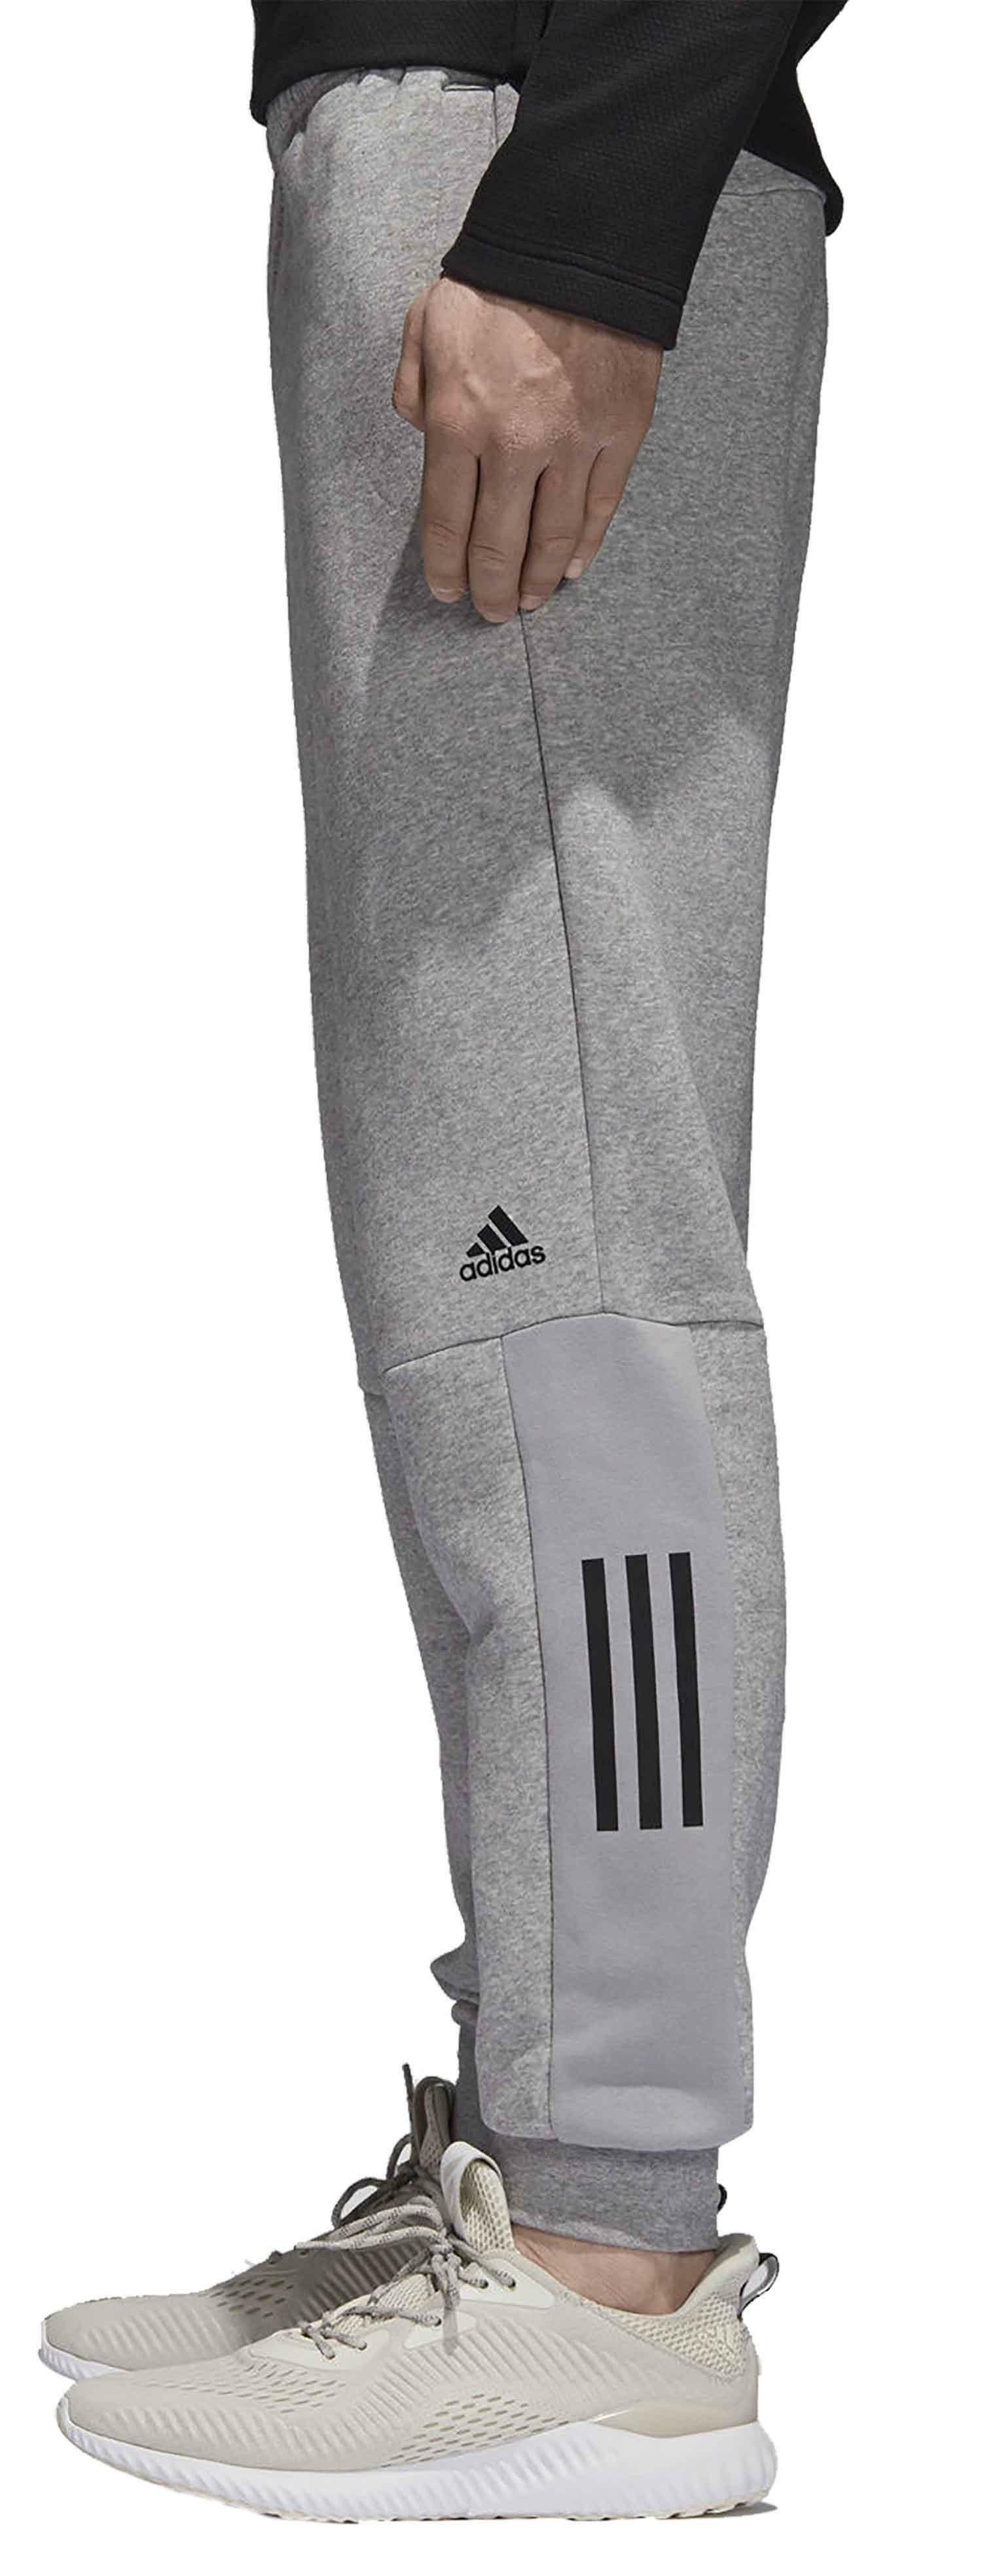 pantaloni tuta adidas uomo cotone